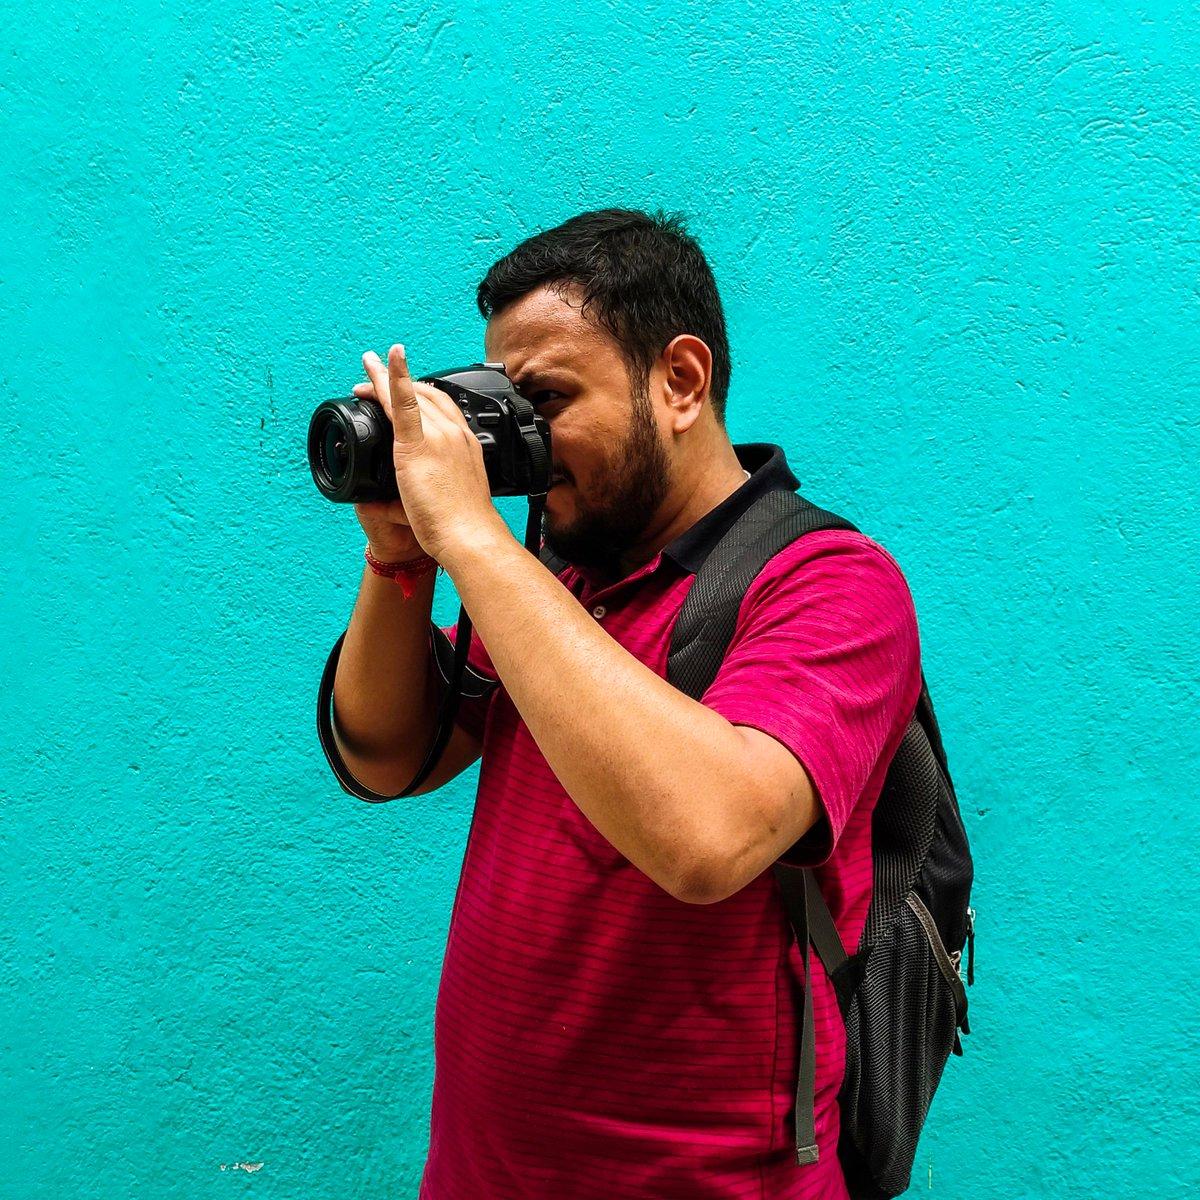 Hello World!  Just setting up my twitter account!  #Kolkata #India #Photographer #StreetPhotographer #DocumentaryPhotographer #Nikon https://t.co/aoXO88pI7R